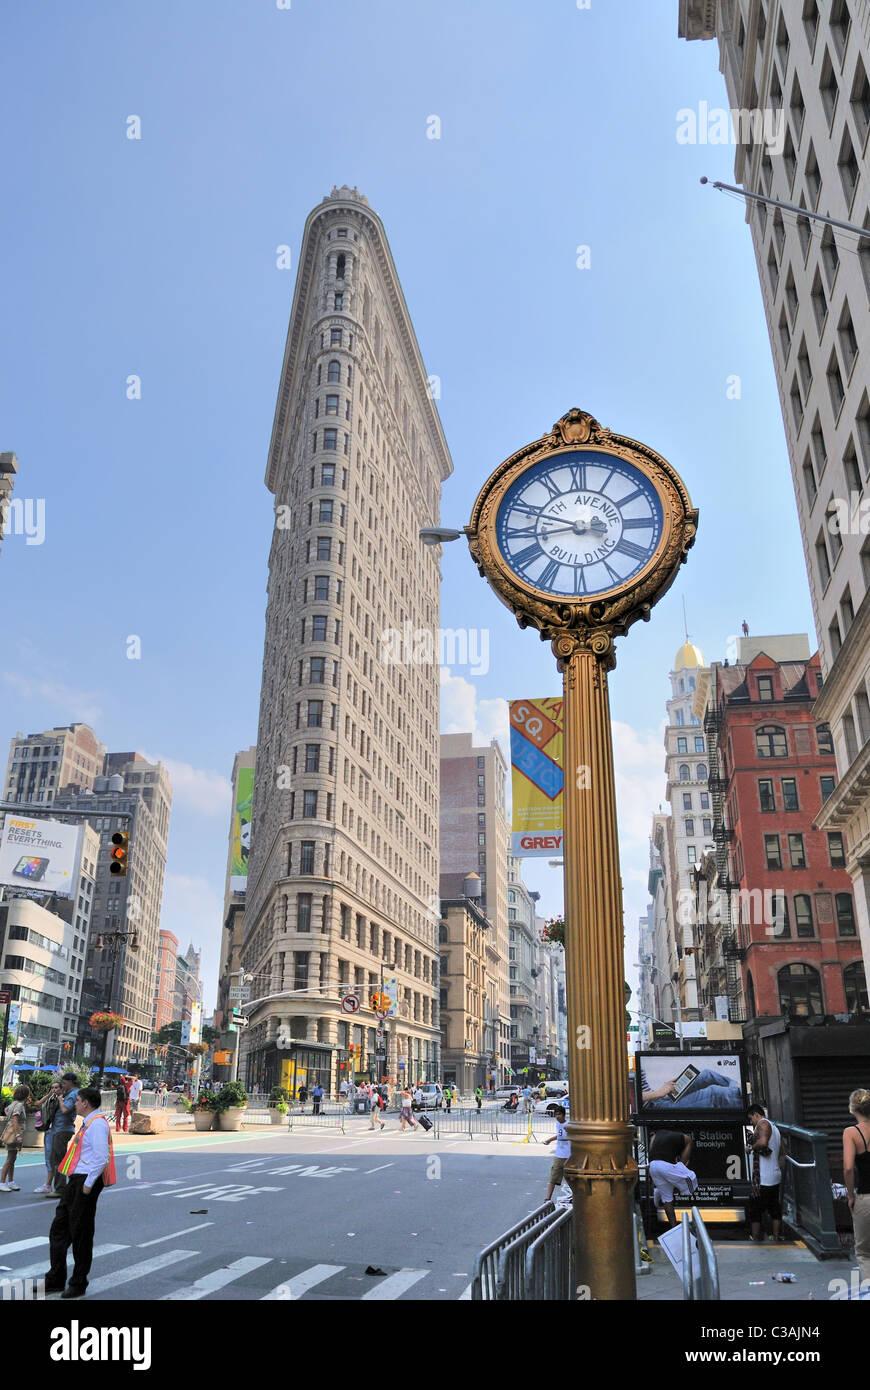 flatiron district in new york city june 27, 2010. - Stock Image